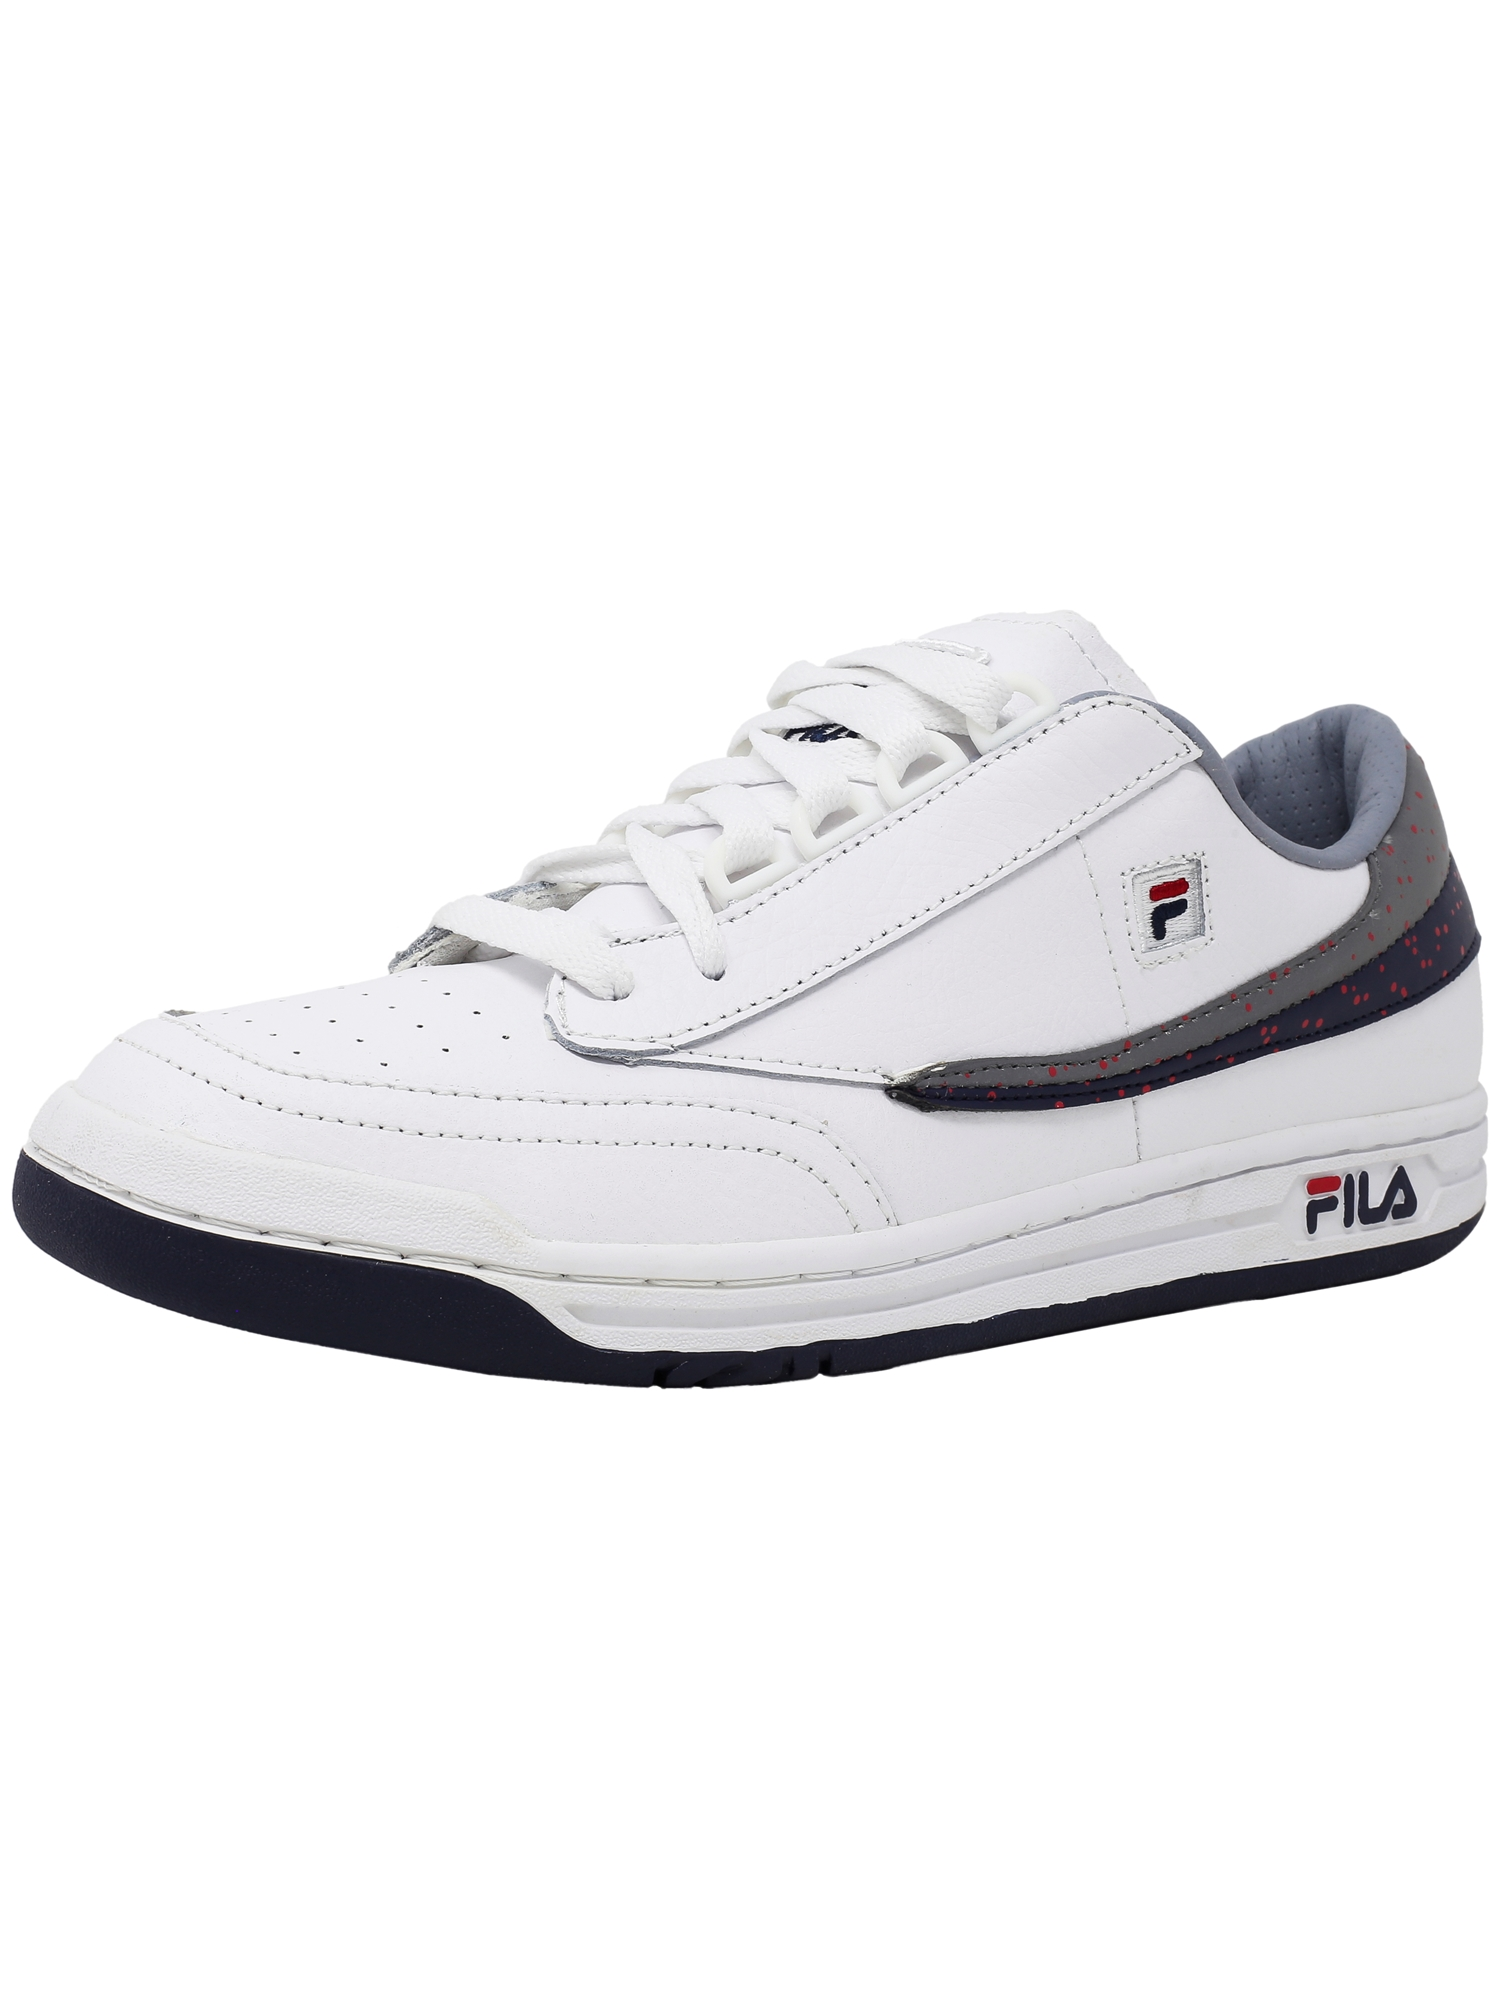 Fila Men's Original Tennis White   Navy High Rise Ankle-High Shoe 8.5M by Fila